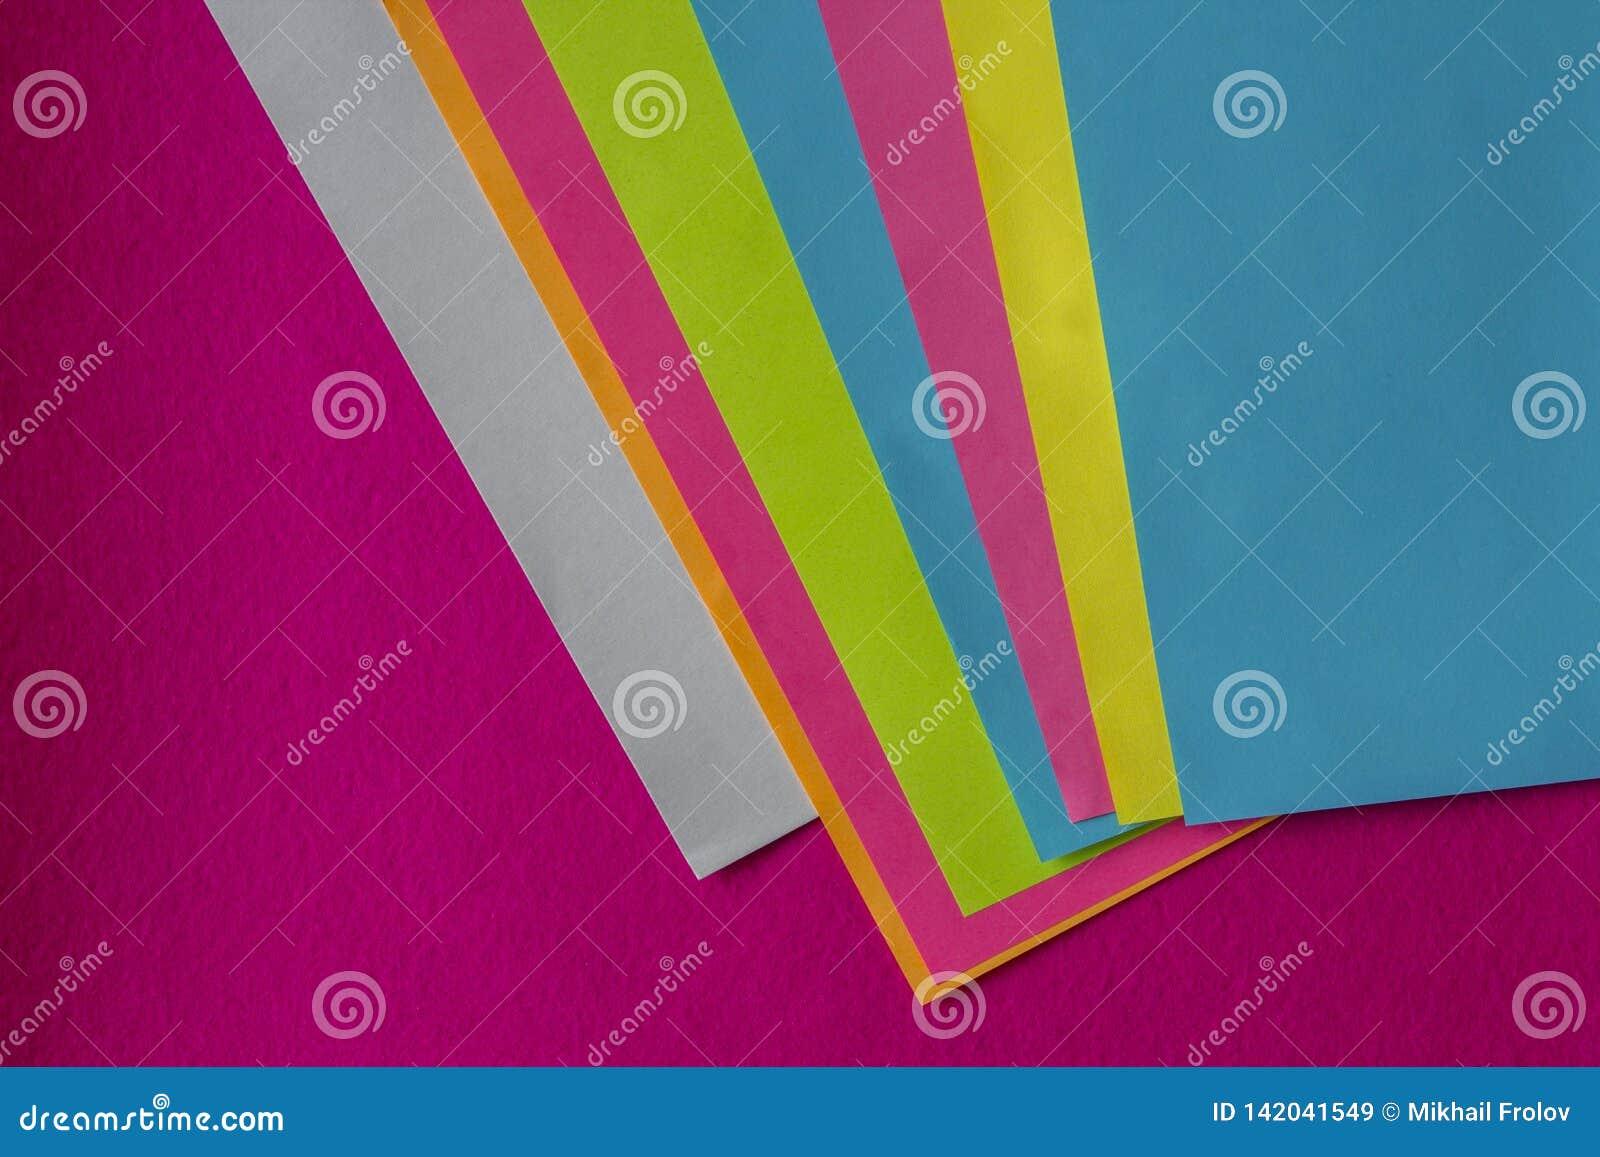 Textura de poucas folhas do papel colorido e do fundo fúcsia